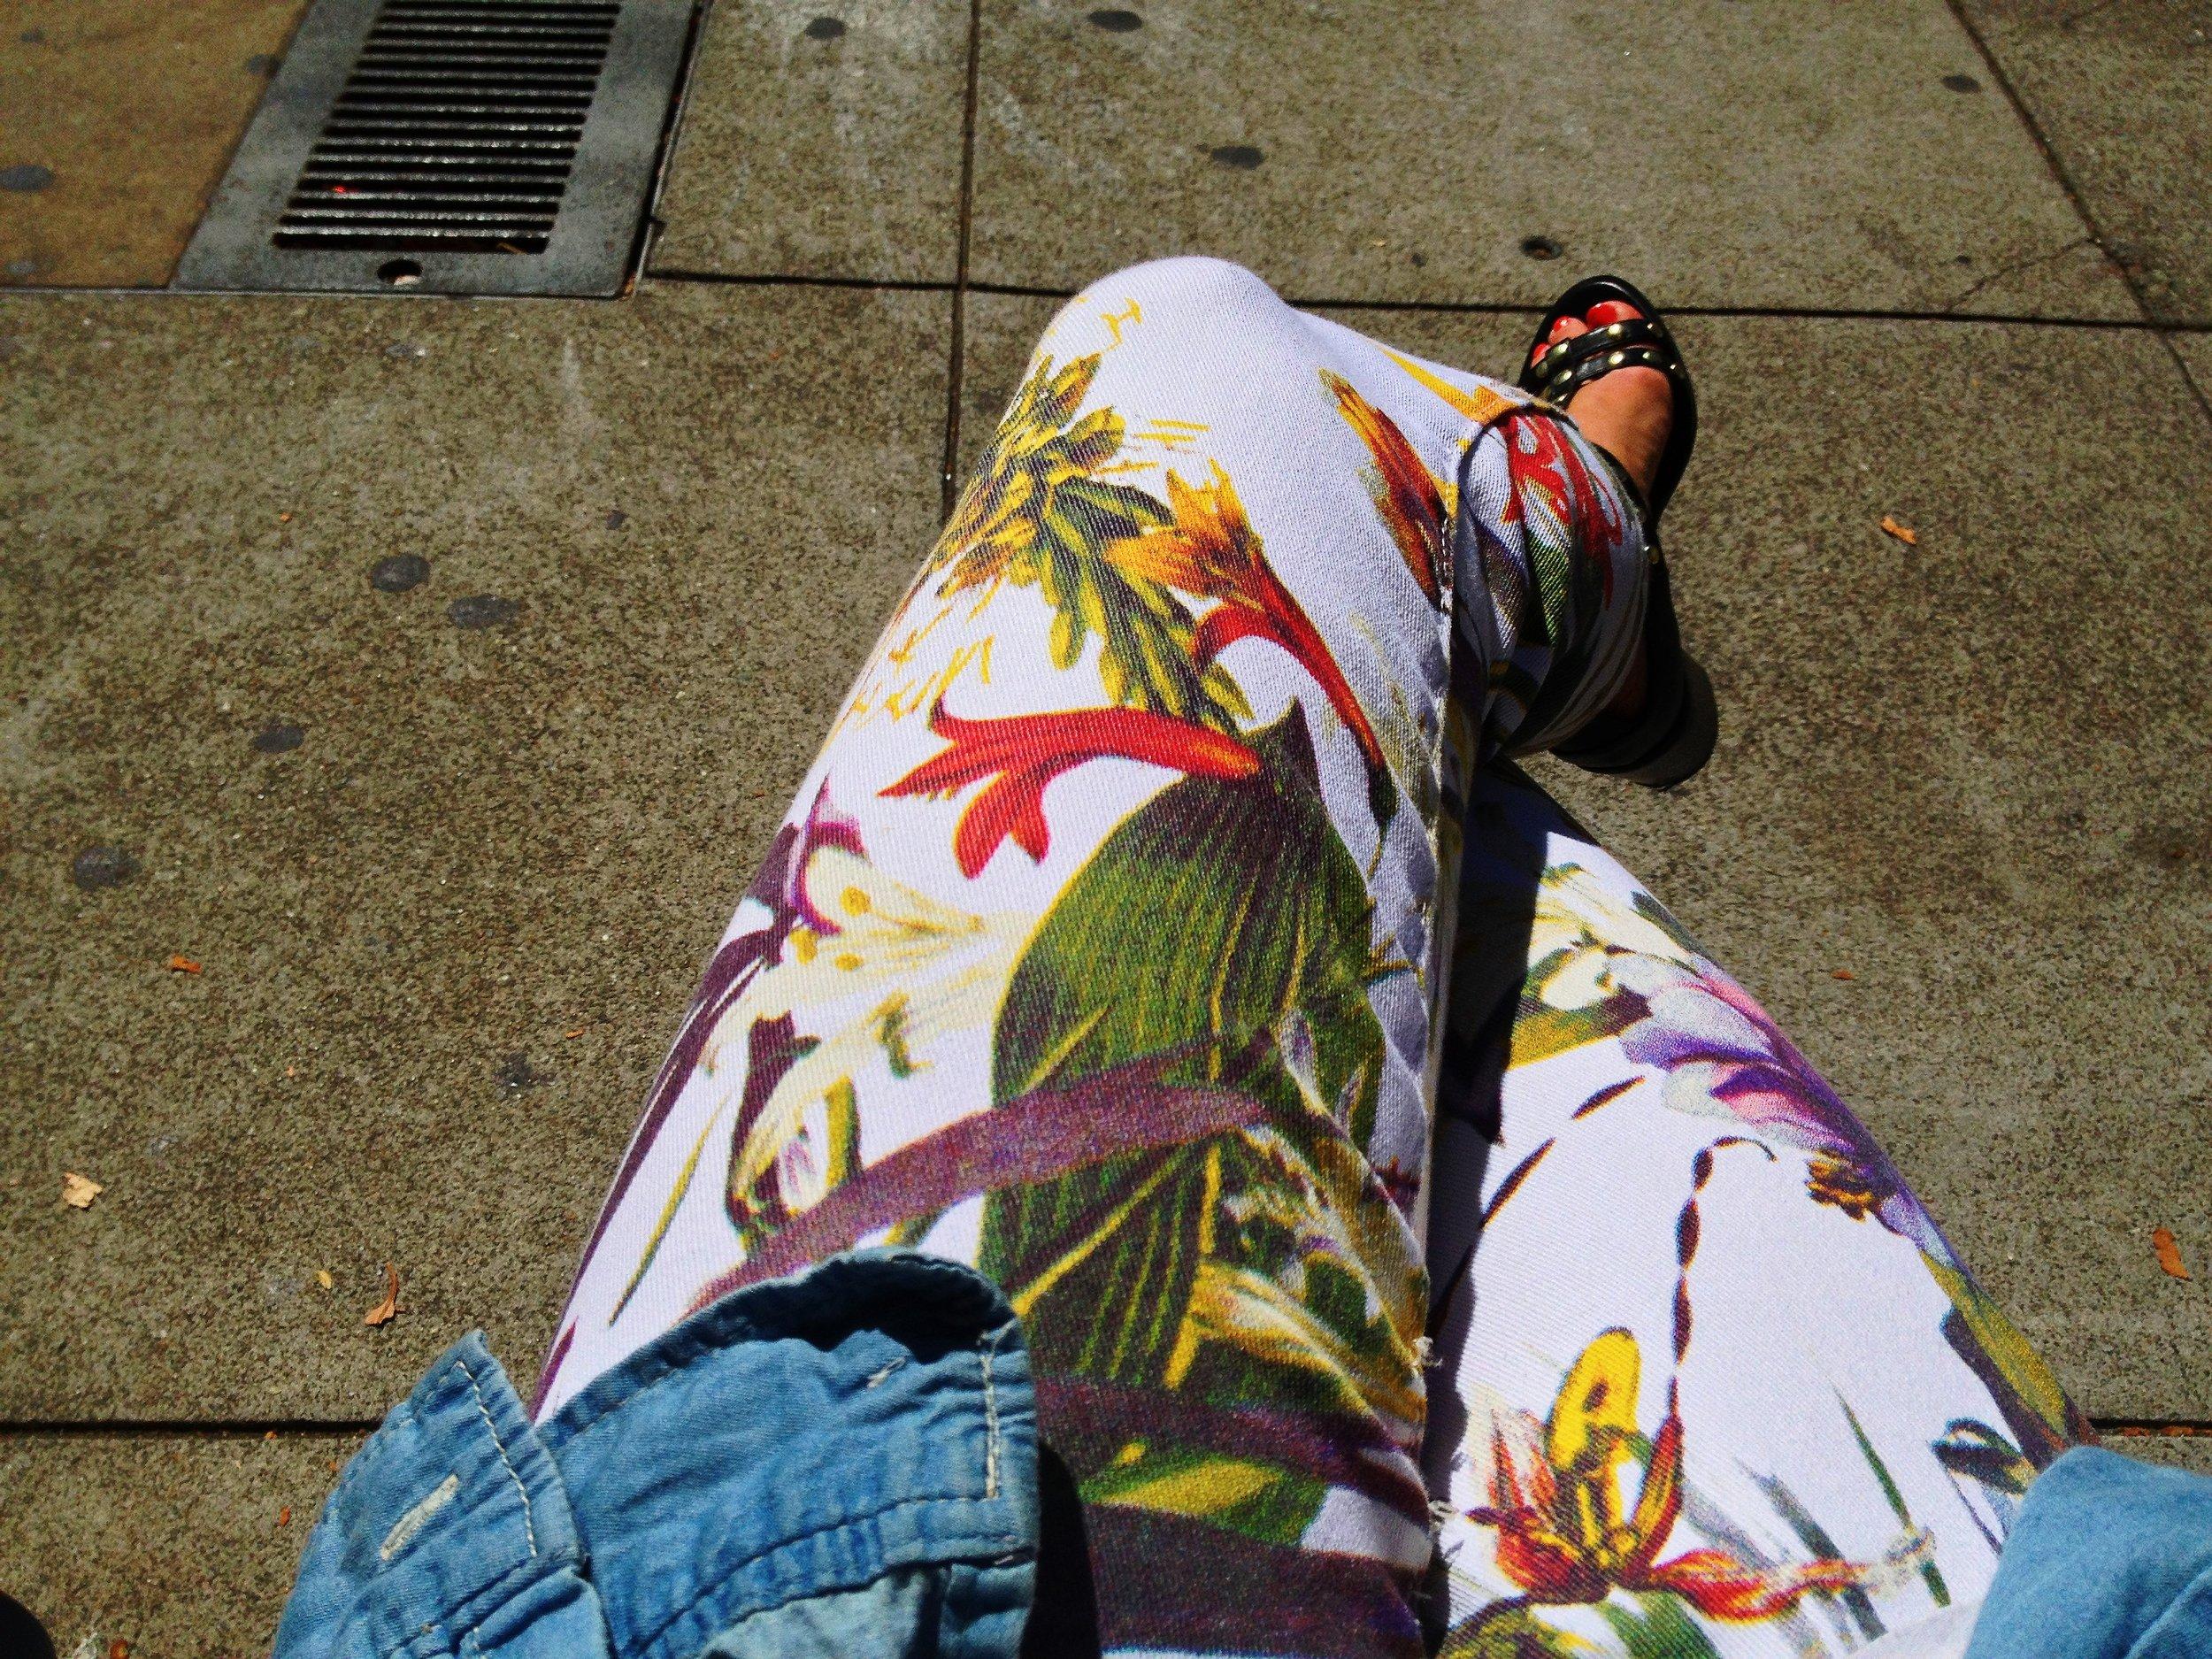 Weekend uniform. Denim and fun floral pants.